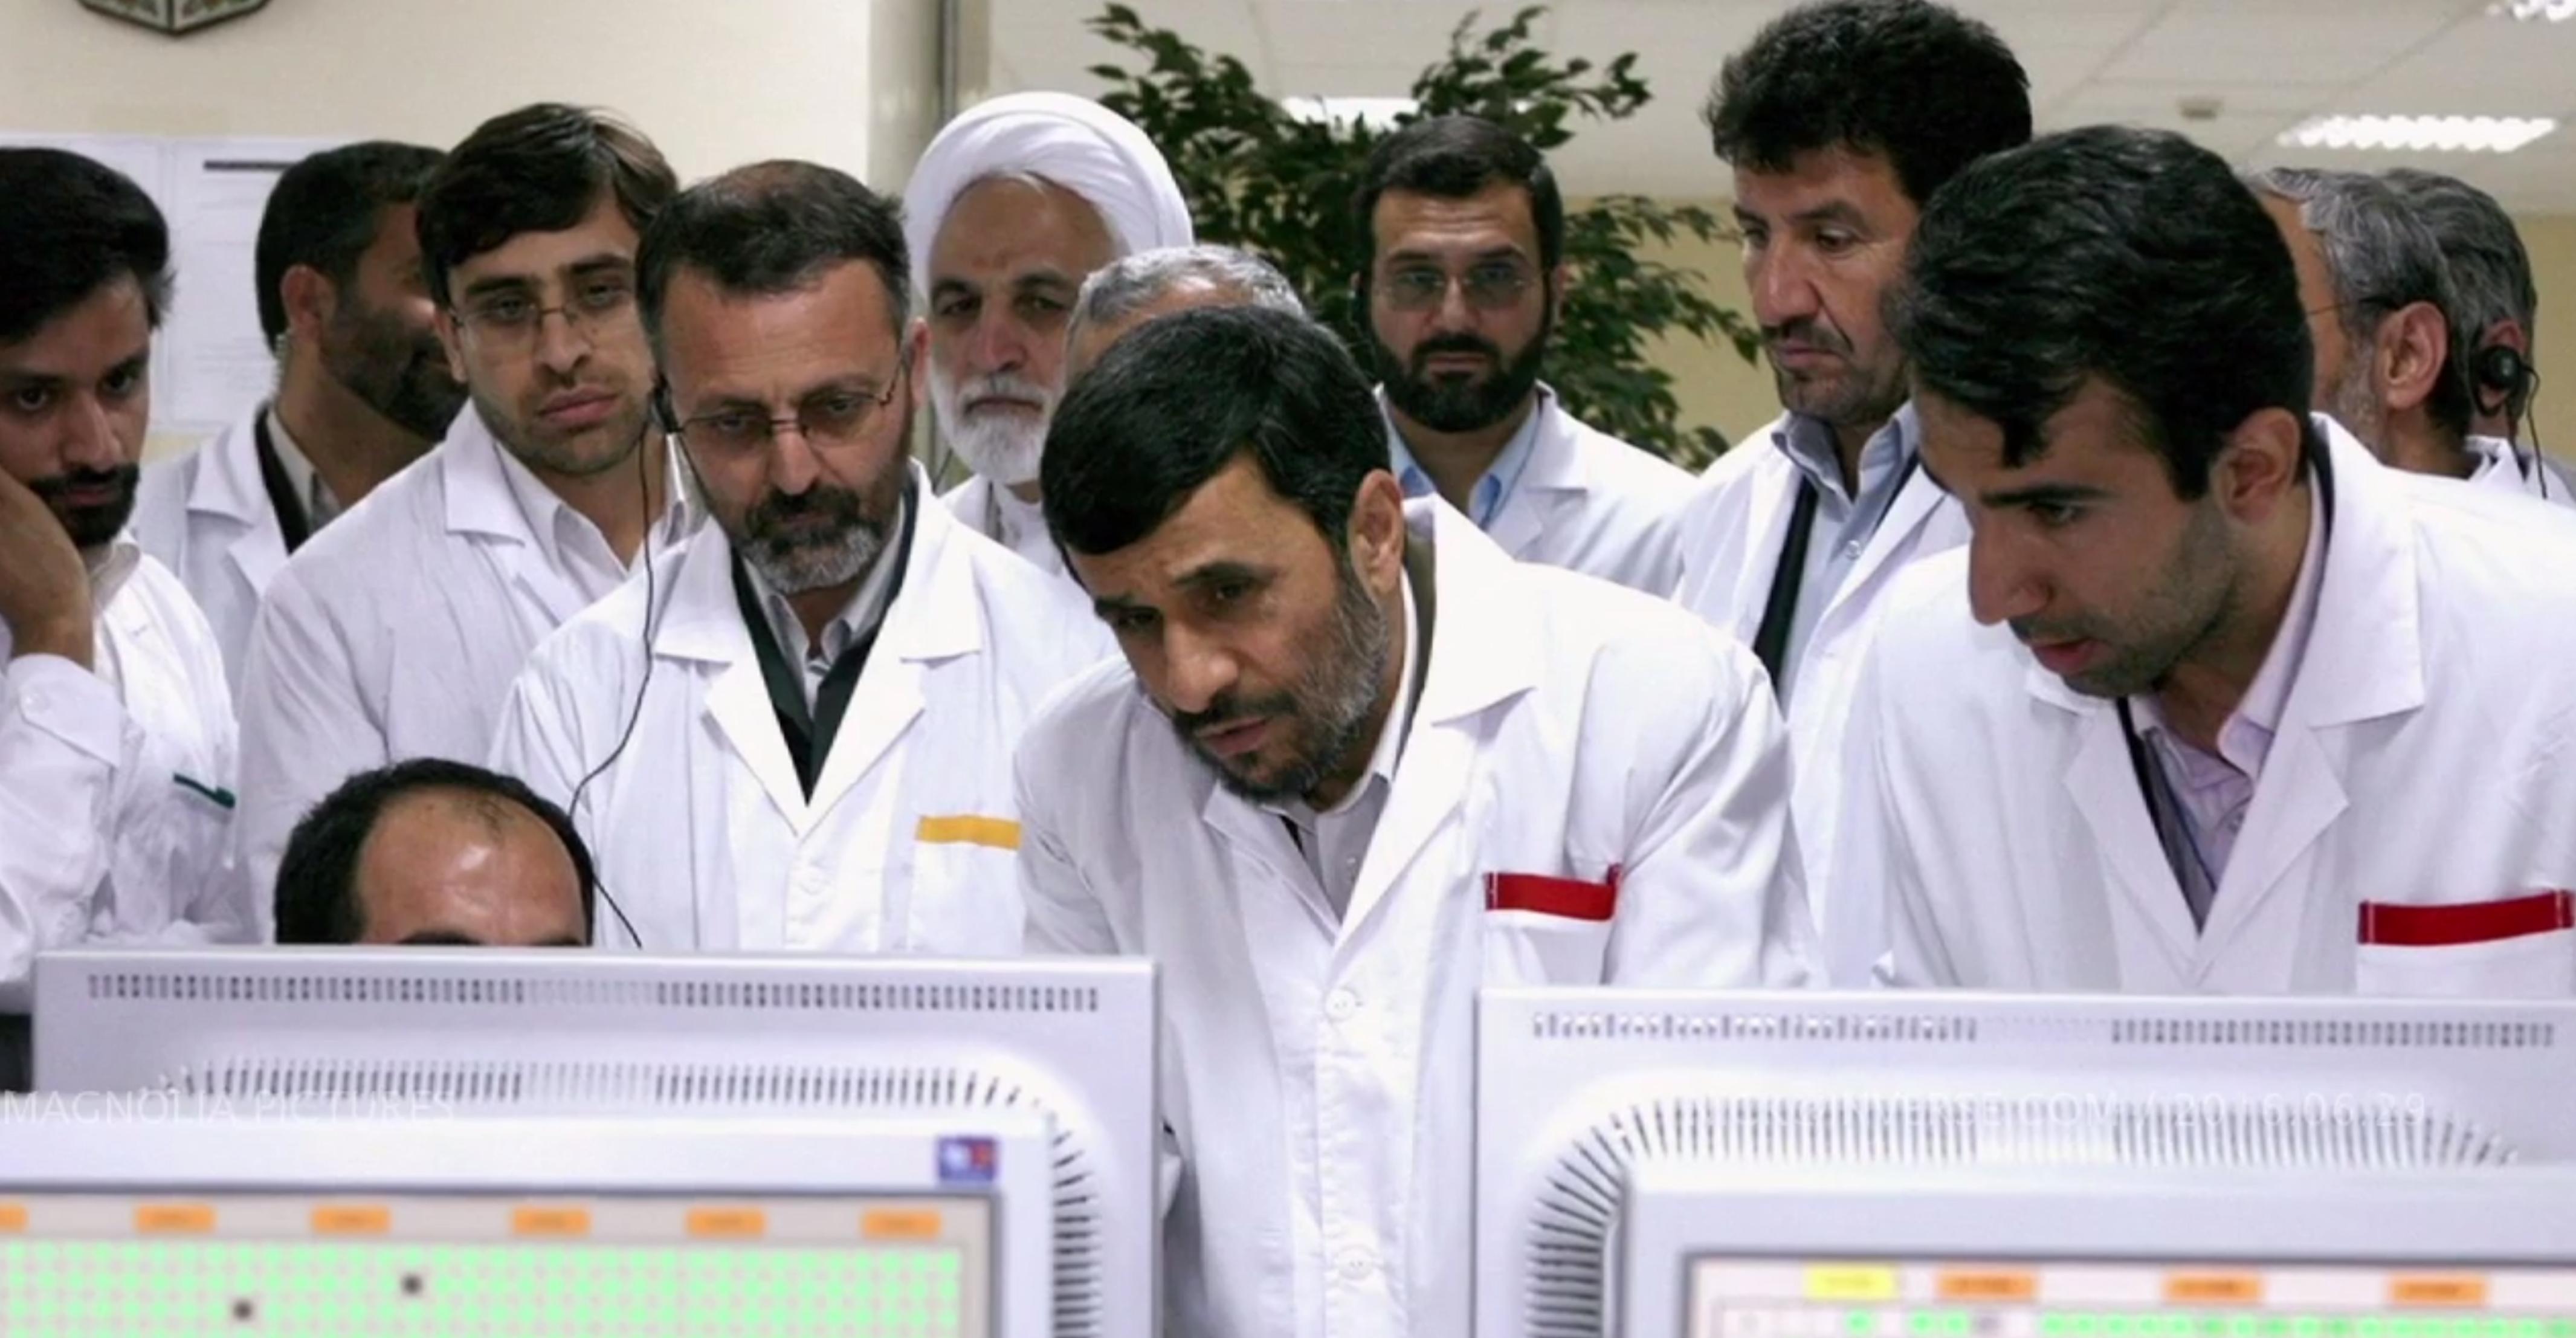 Then-Iranian President Mahmoud Ahmadinejad at Natanz nuclear facility in Iran. The publicity photo let leak vital intelligence information.